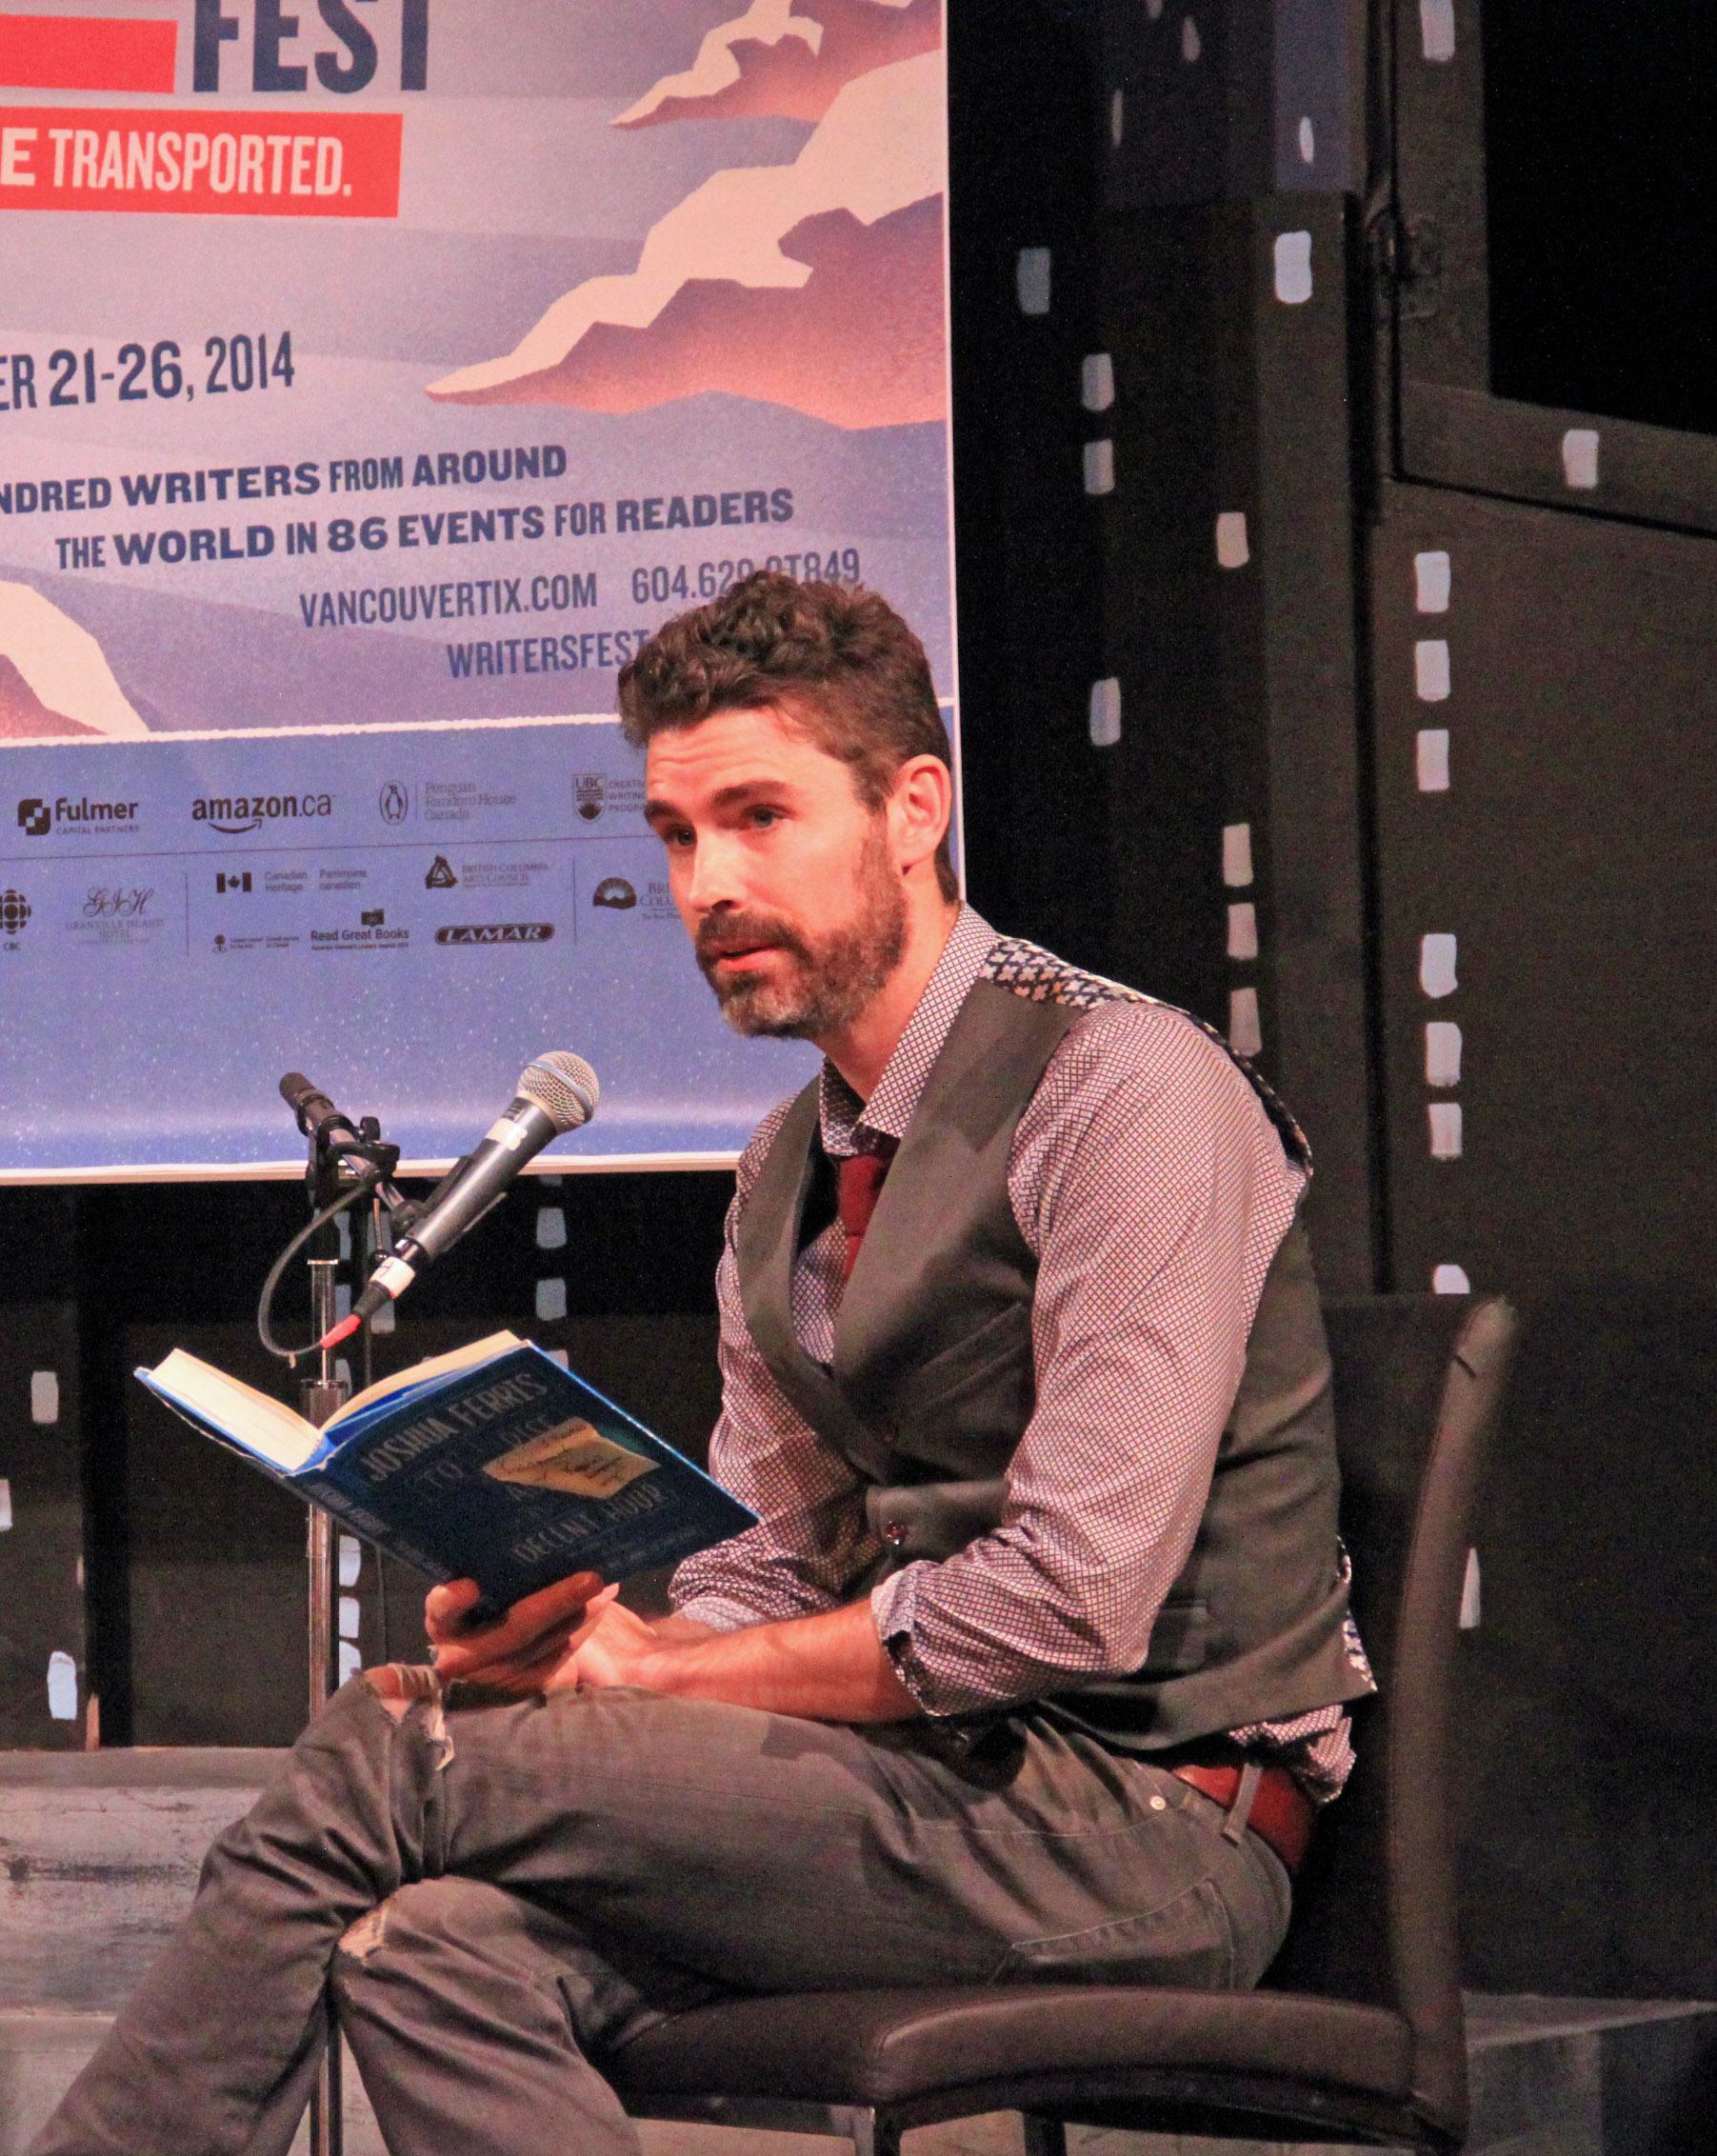 Joshua Ferris At The 2014 Festival Photo Credit: Us Embassy Canada